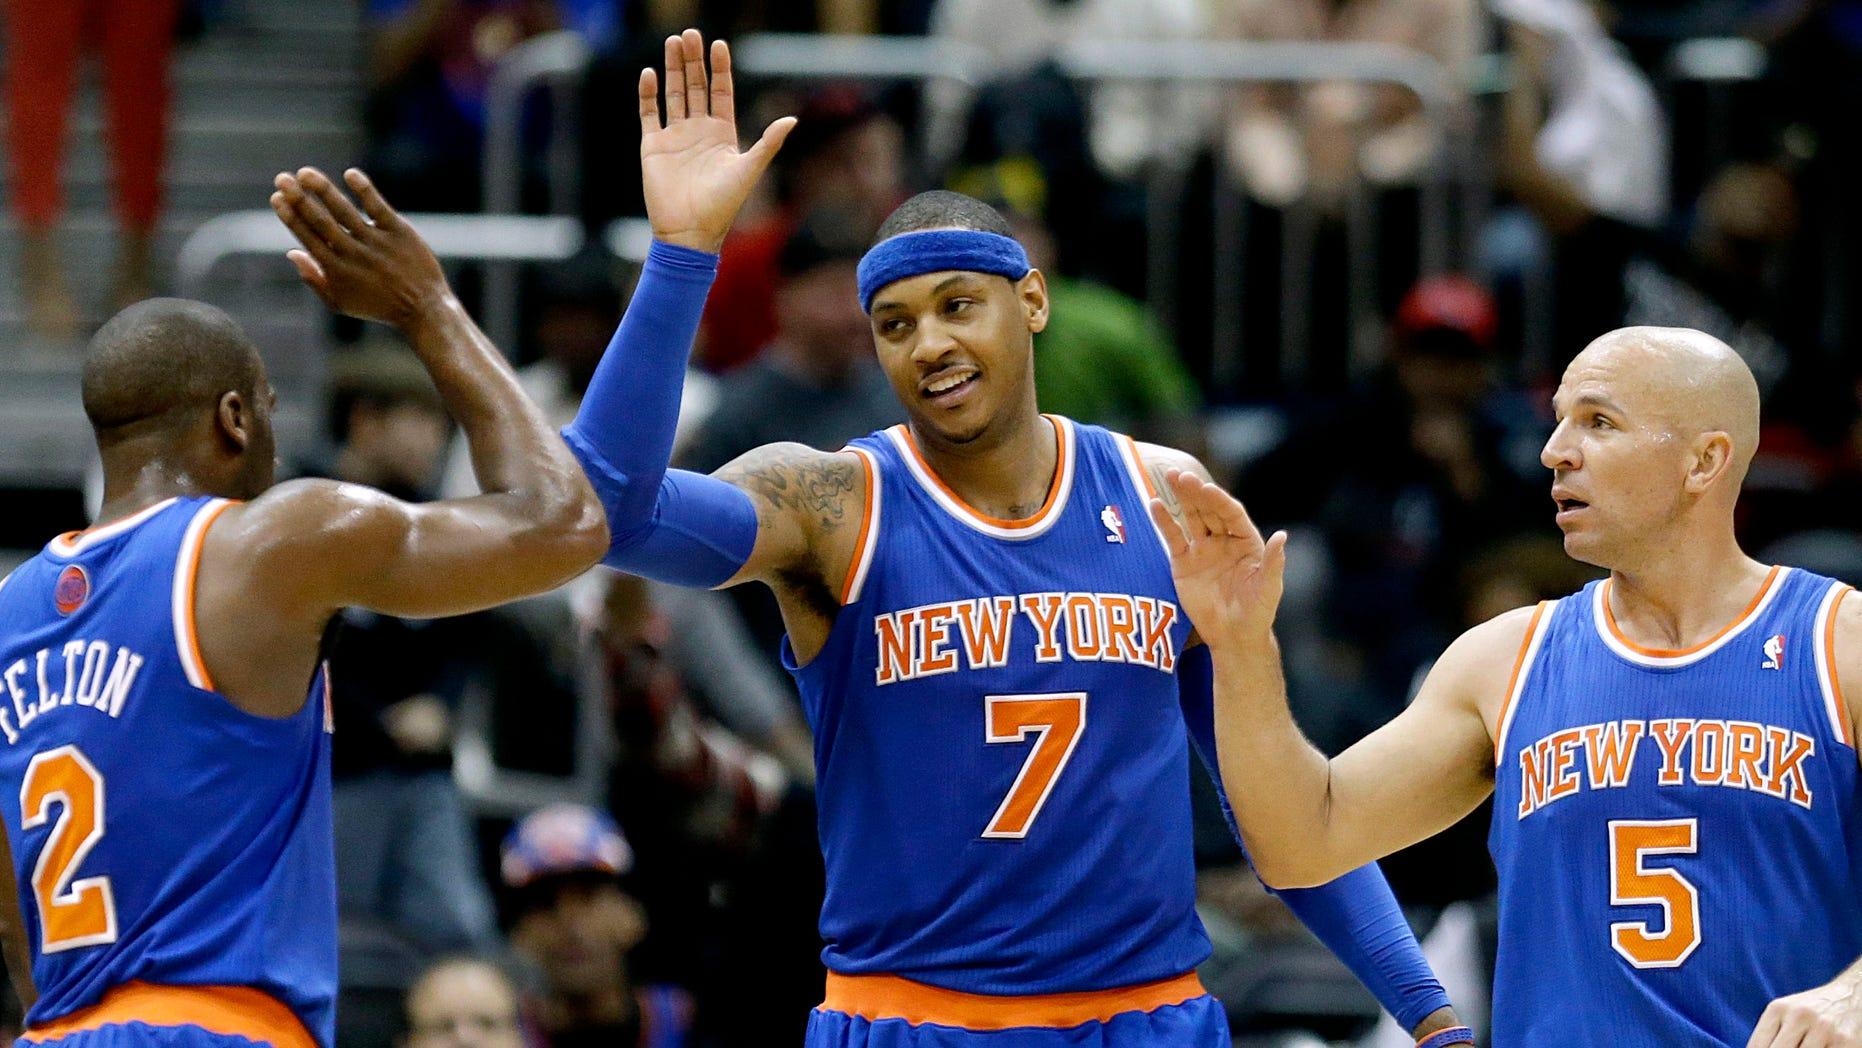 New York Knicks' Carmelo Anthony, center, high-fives teammates Raymond Felton, left, and Jason Kidd after the Knicks beat the Atlanta Hawks 95-82 in an NBA basketball game, Wednesday, April 3, 2013, in Atlanta. (AP Photo/David Goldman)